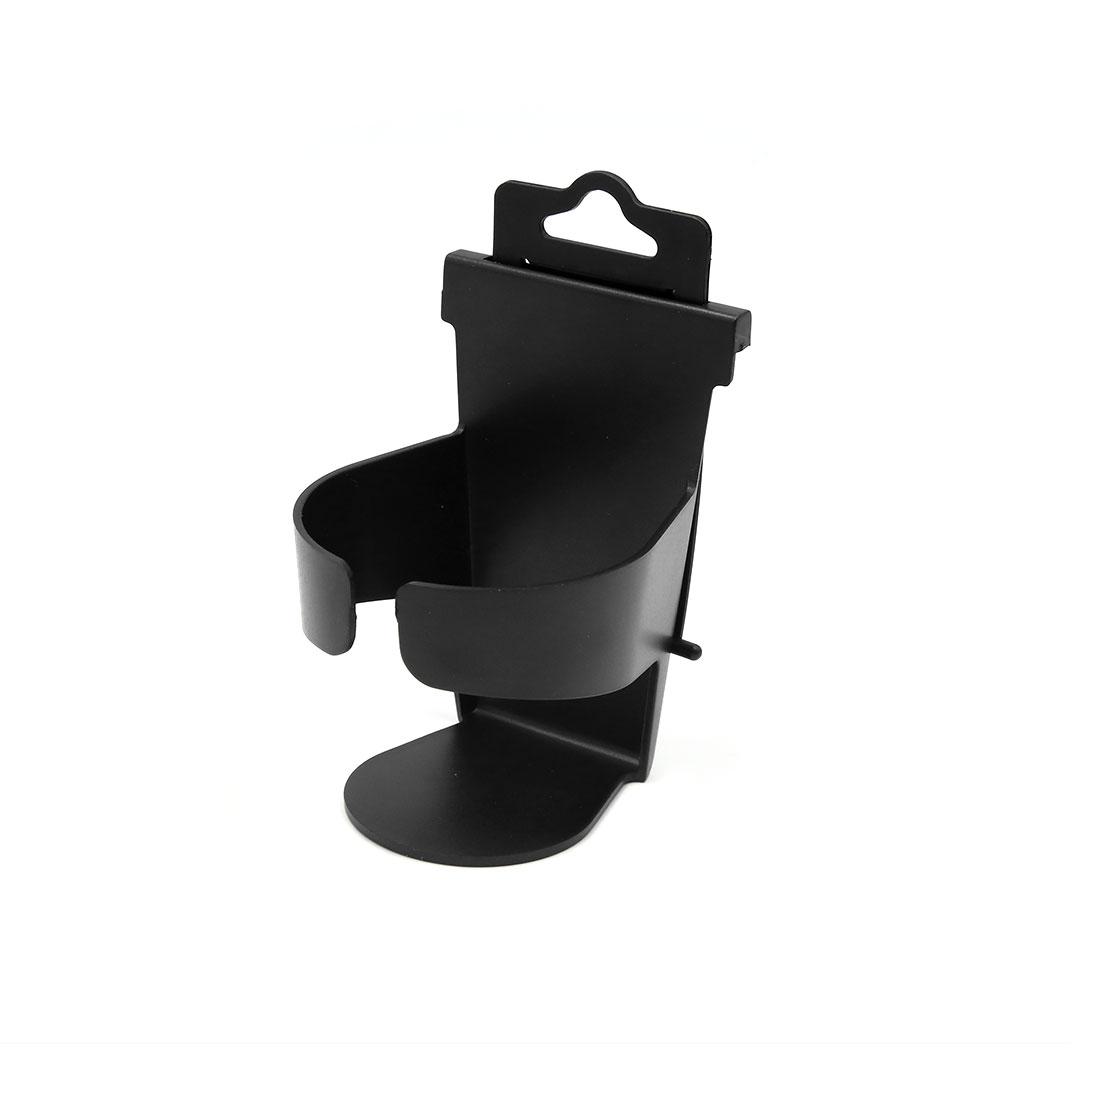 Black Portable Auto Car Truck Door Mount Beverage Drink Bottle Cup Holder Stand